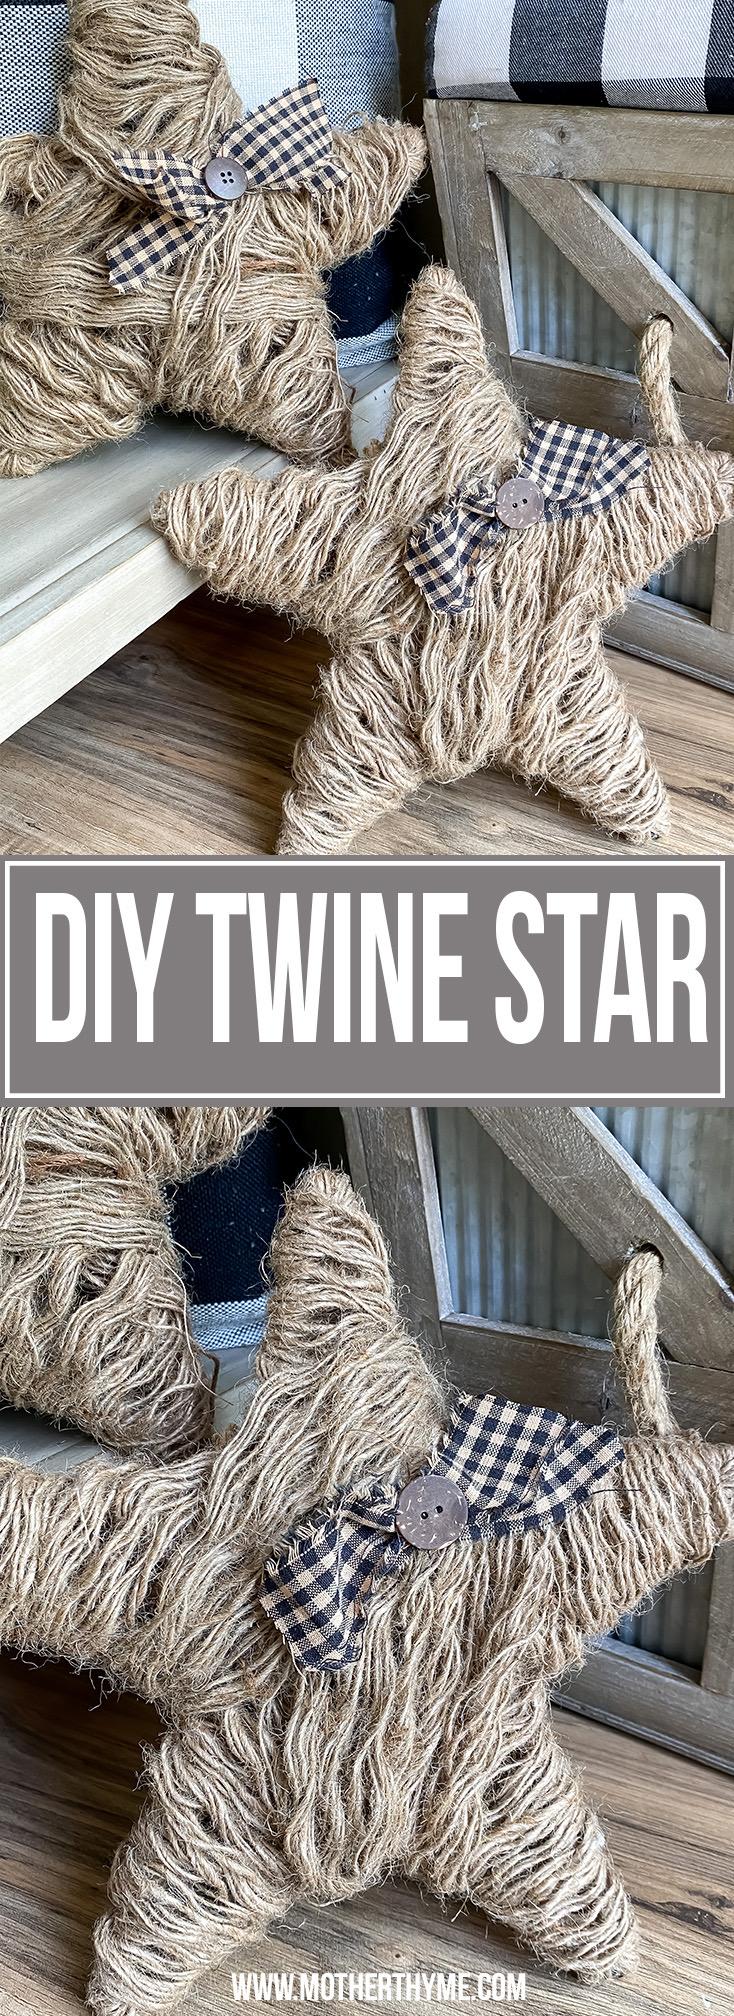 DIY TWINE STAR